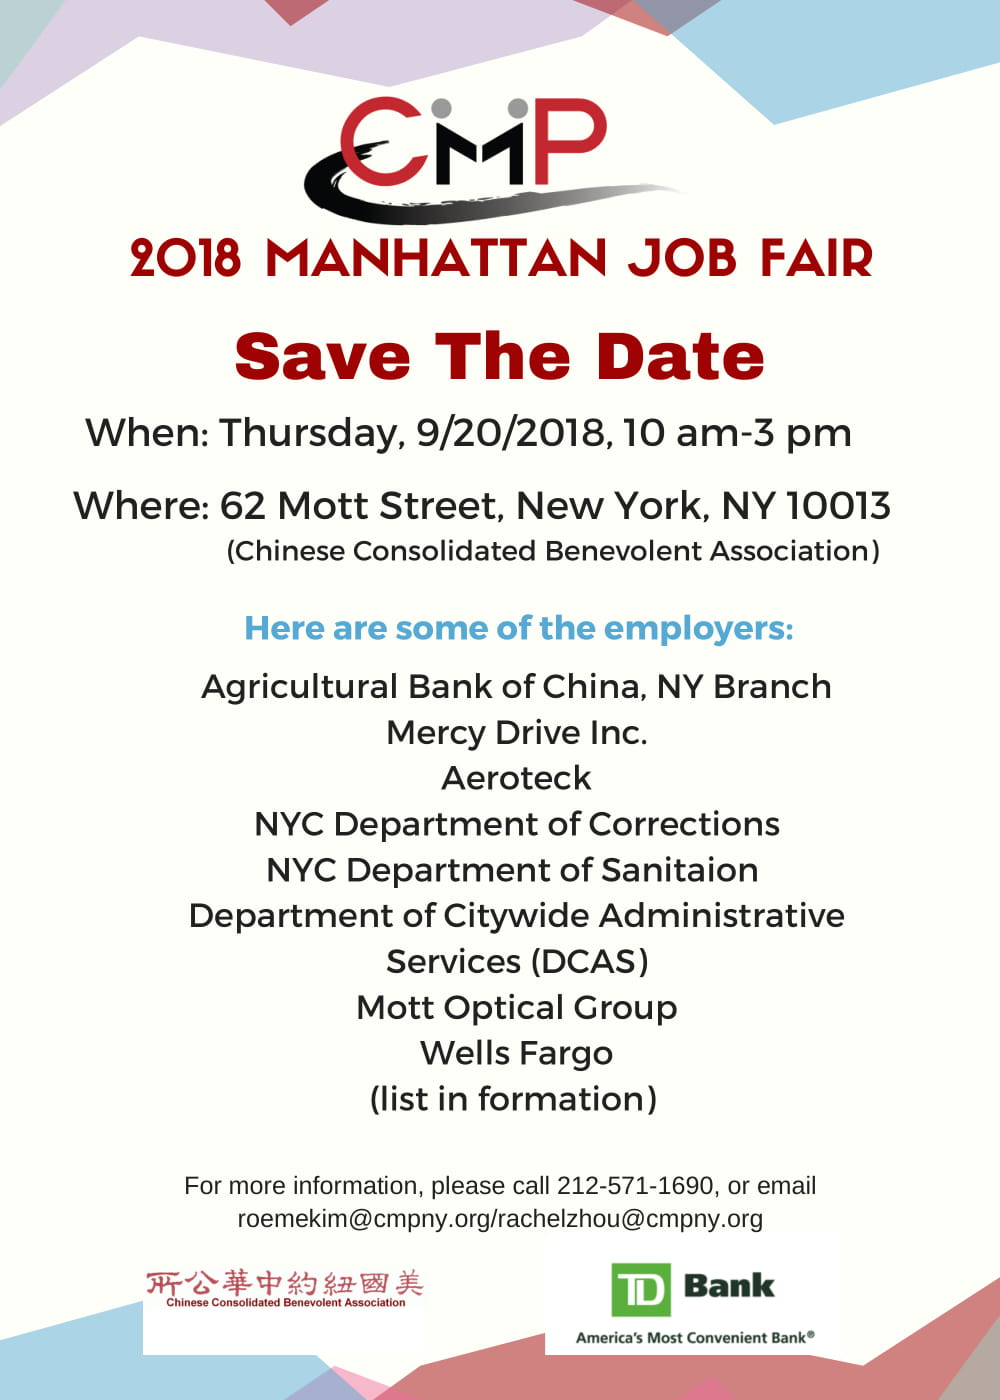 Save The Date for Our 2018 Manhattan Job Fair! -